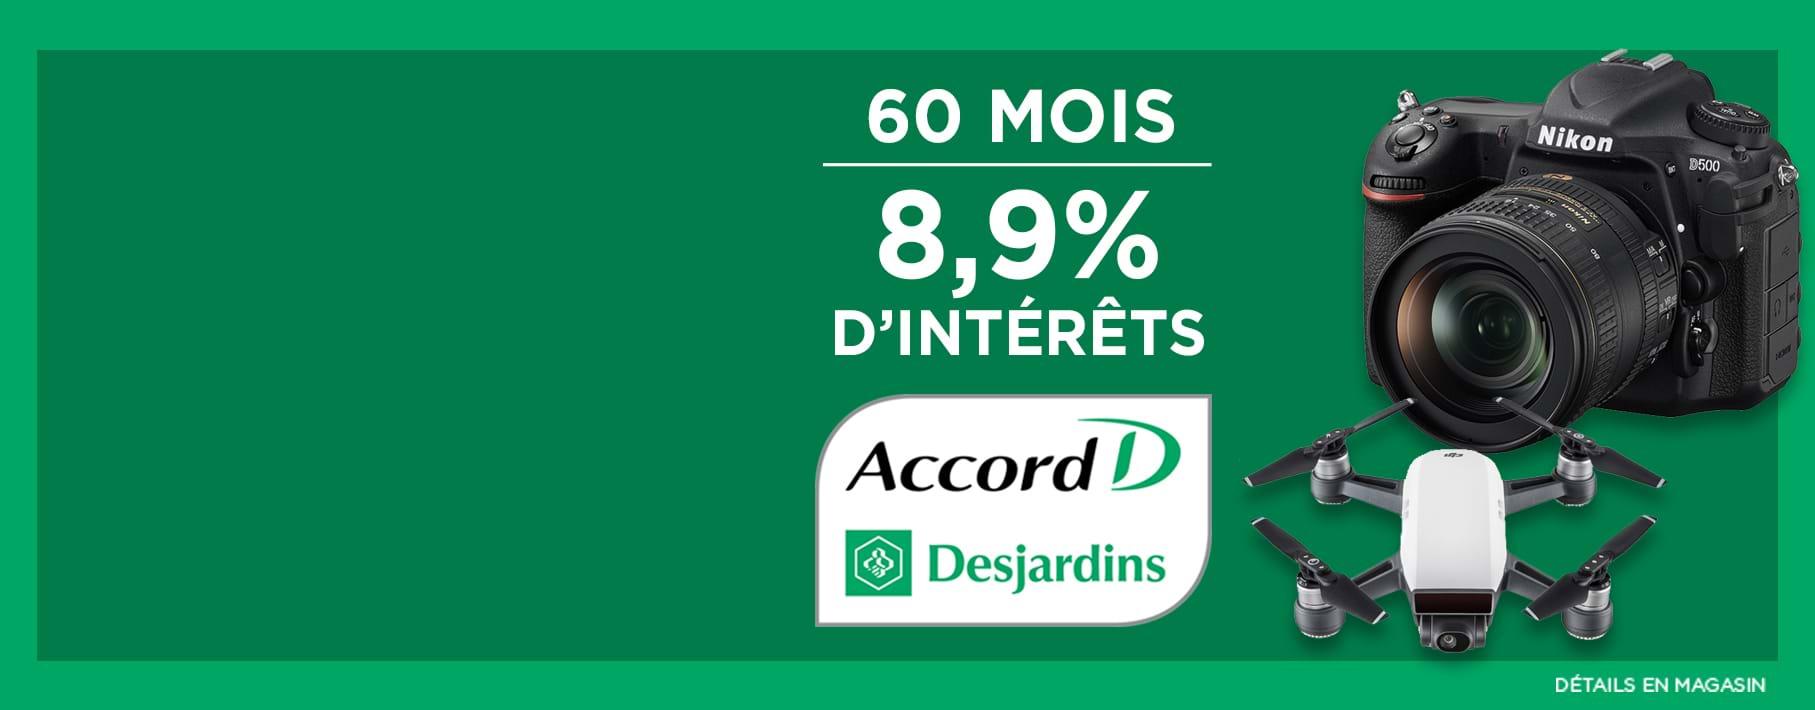 Accord D Promo